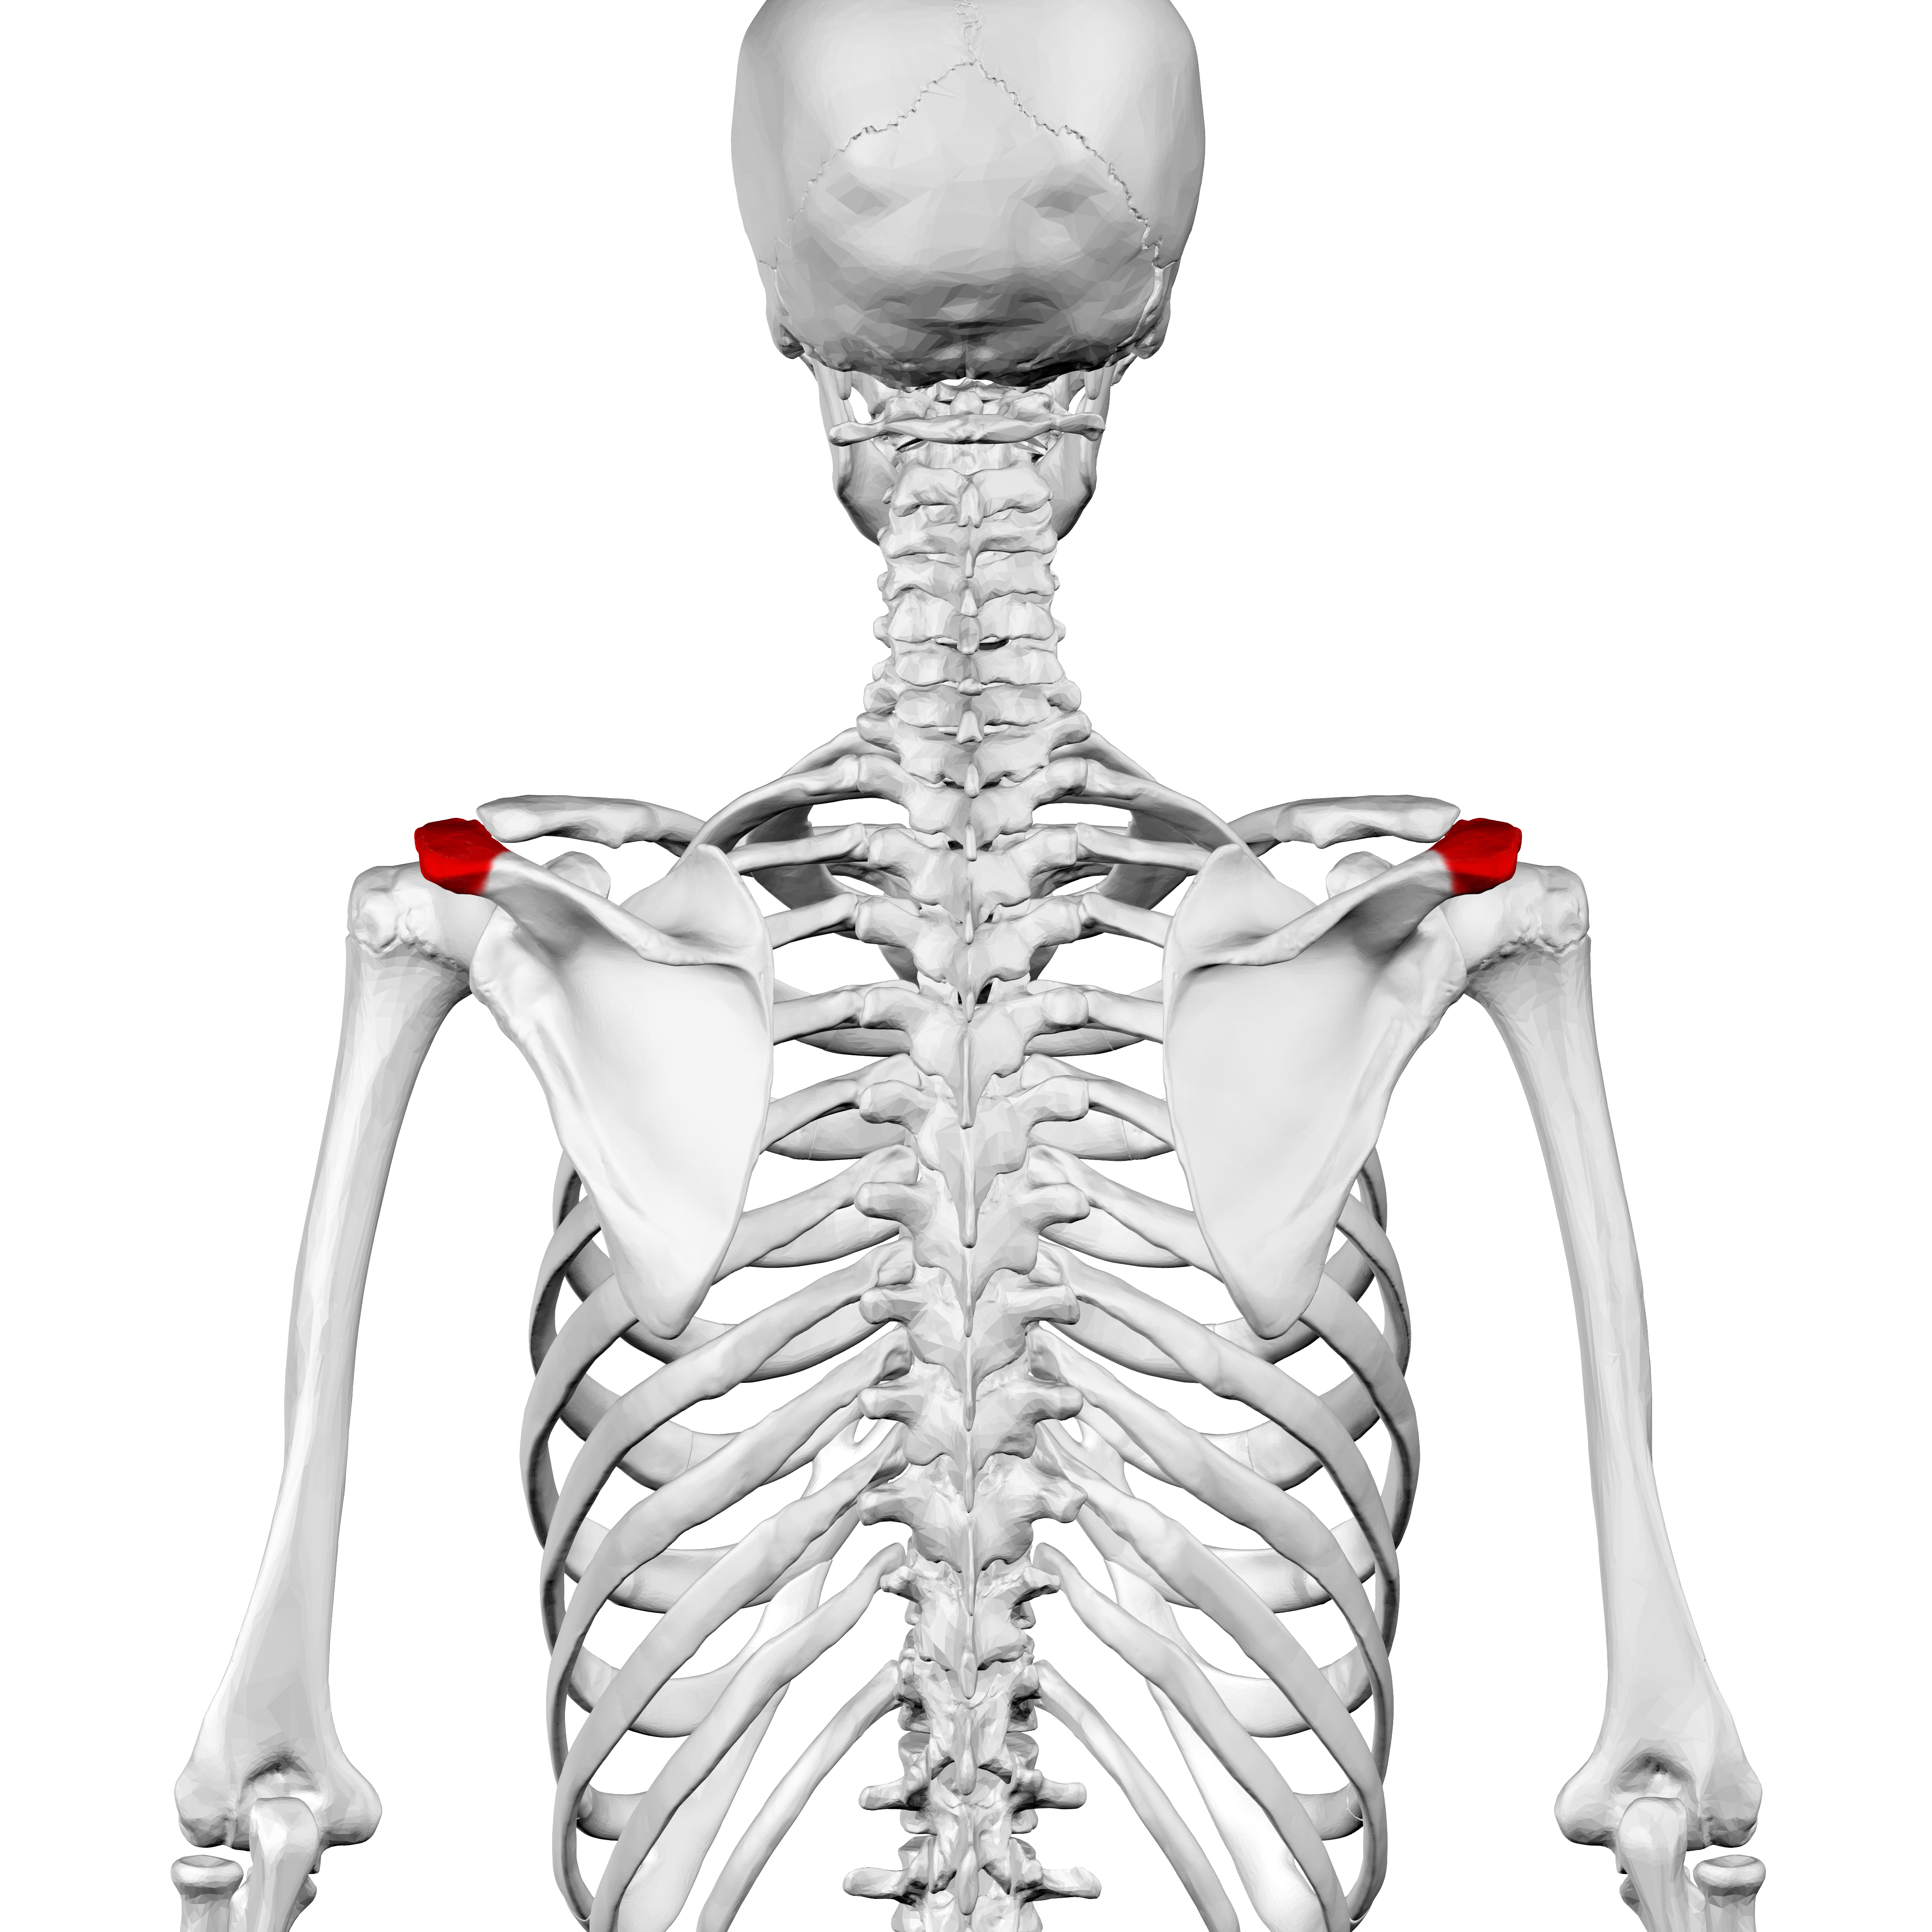 Acromion of scapula